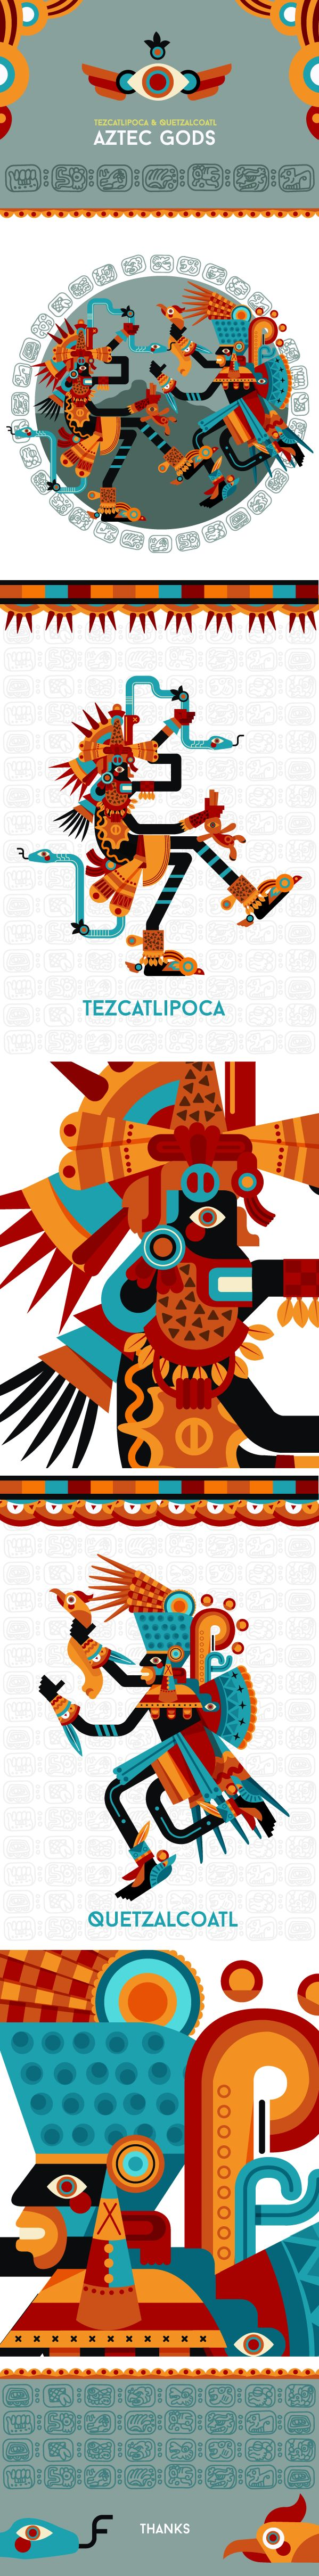 Tezcatlipoca & Quetzalcoatl